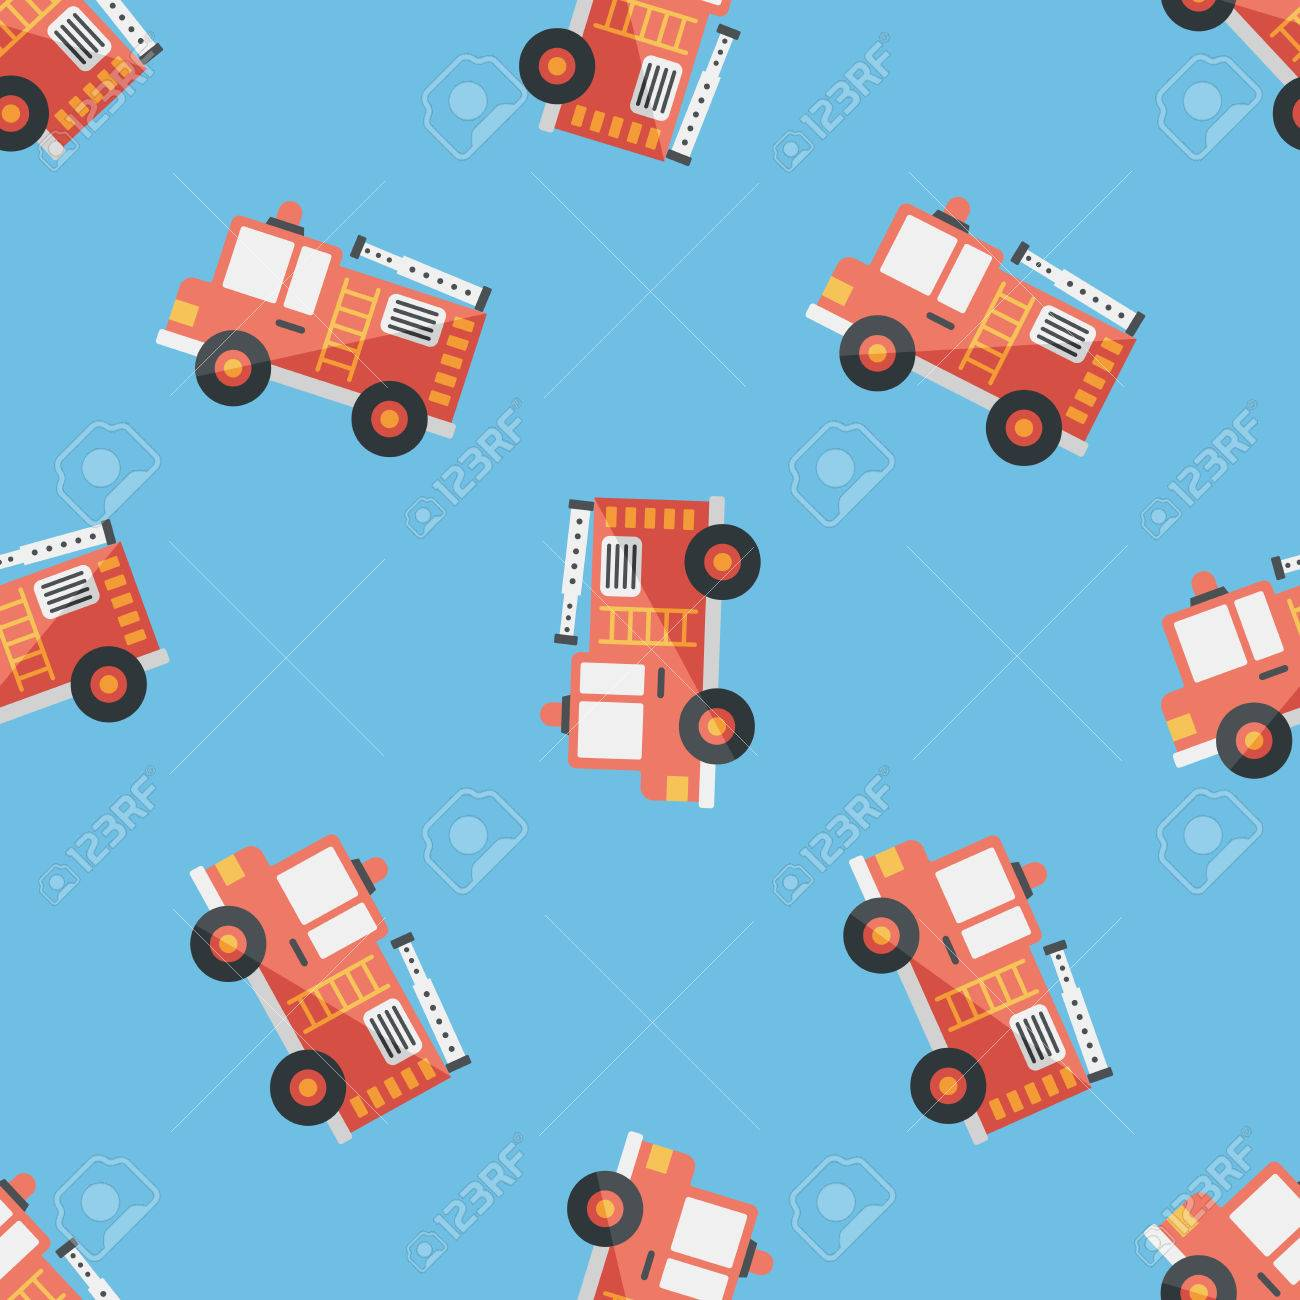 transportation fire truck flat icon eps10 seamless pattern